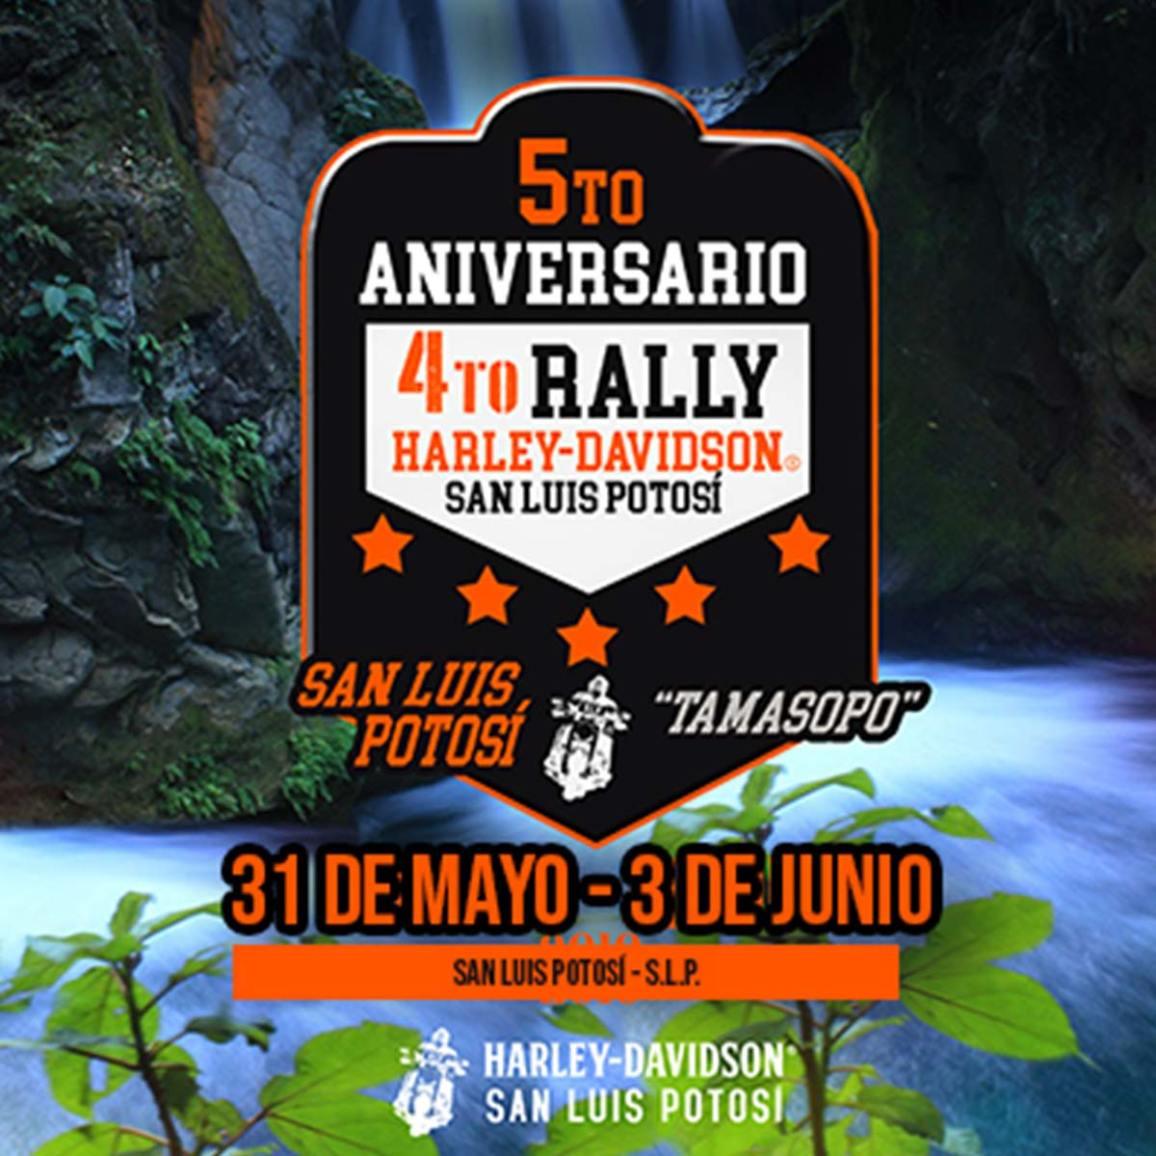 rally harley SLP